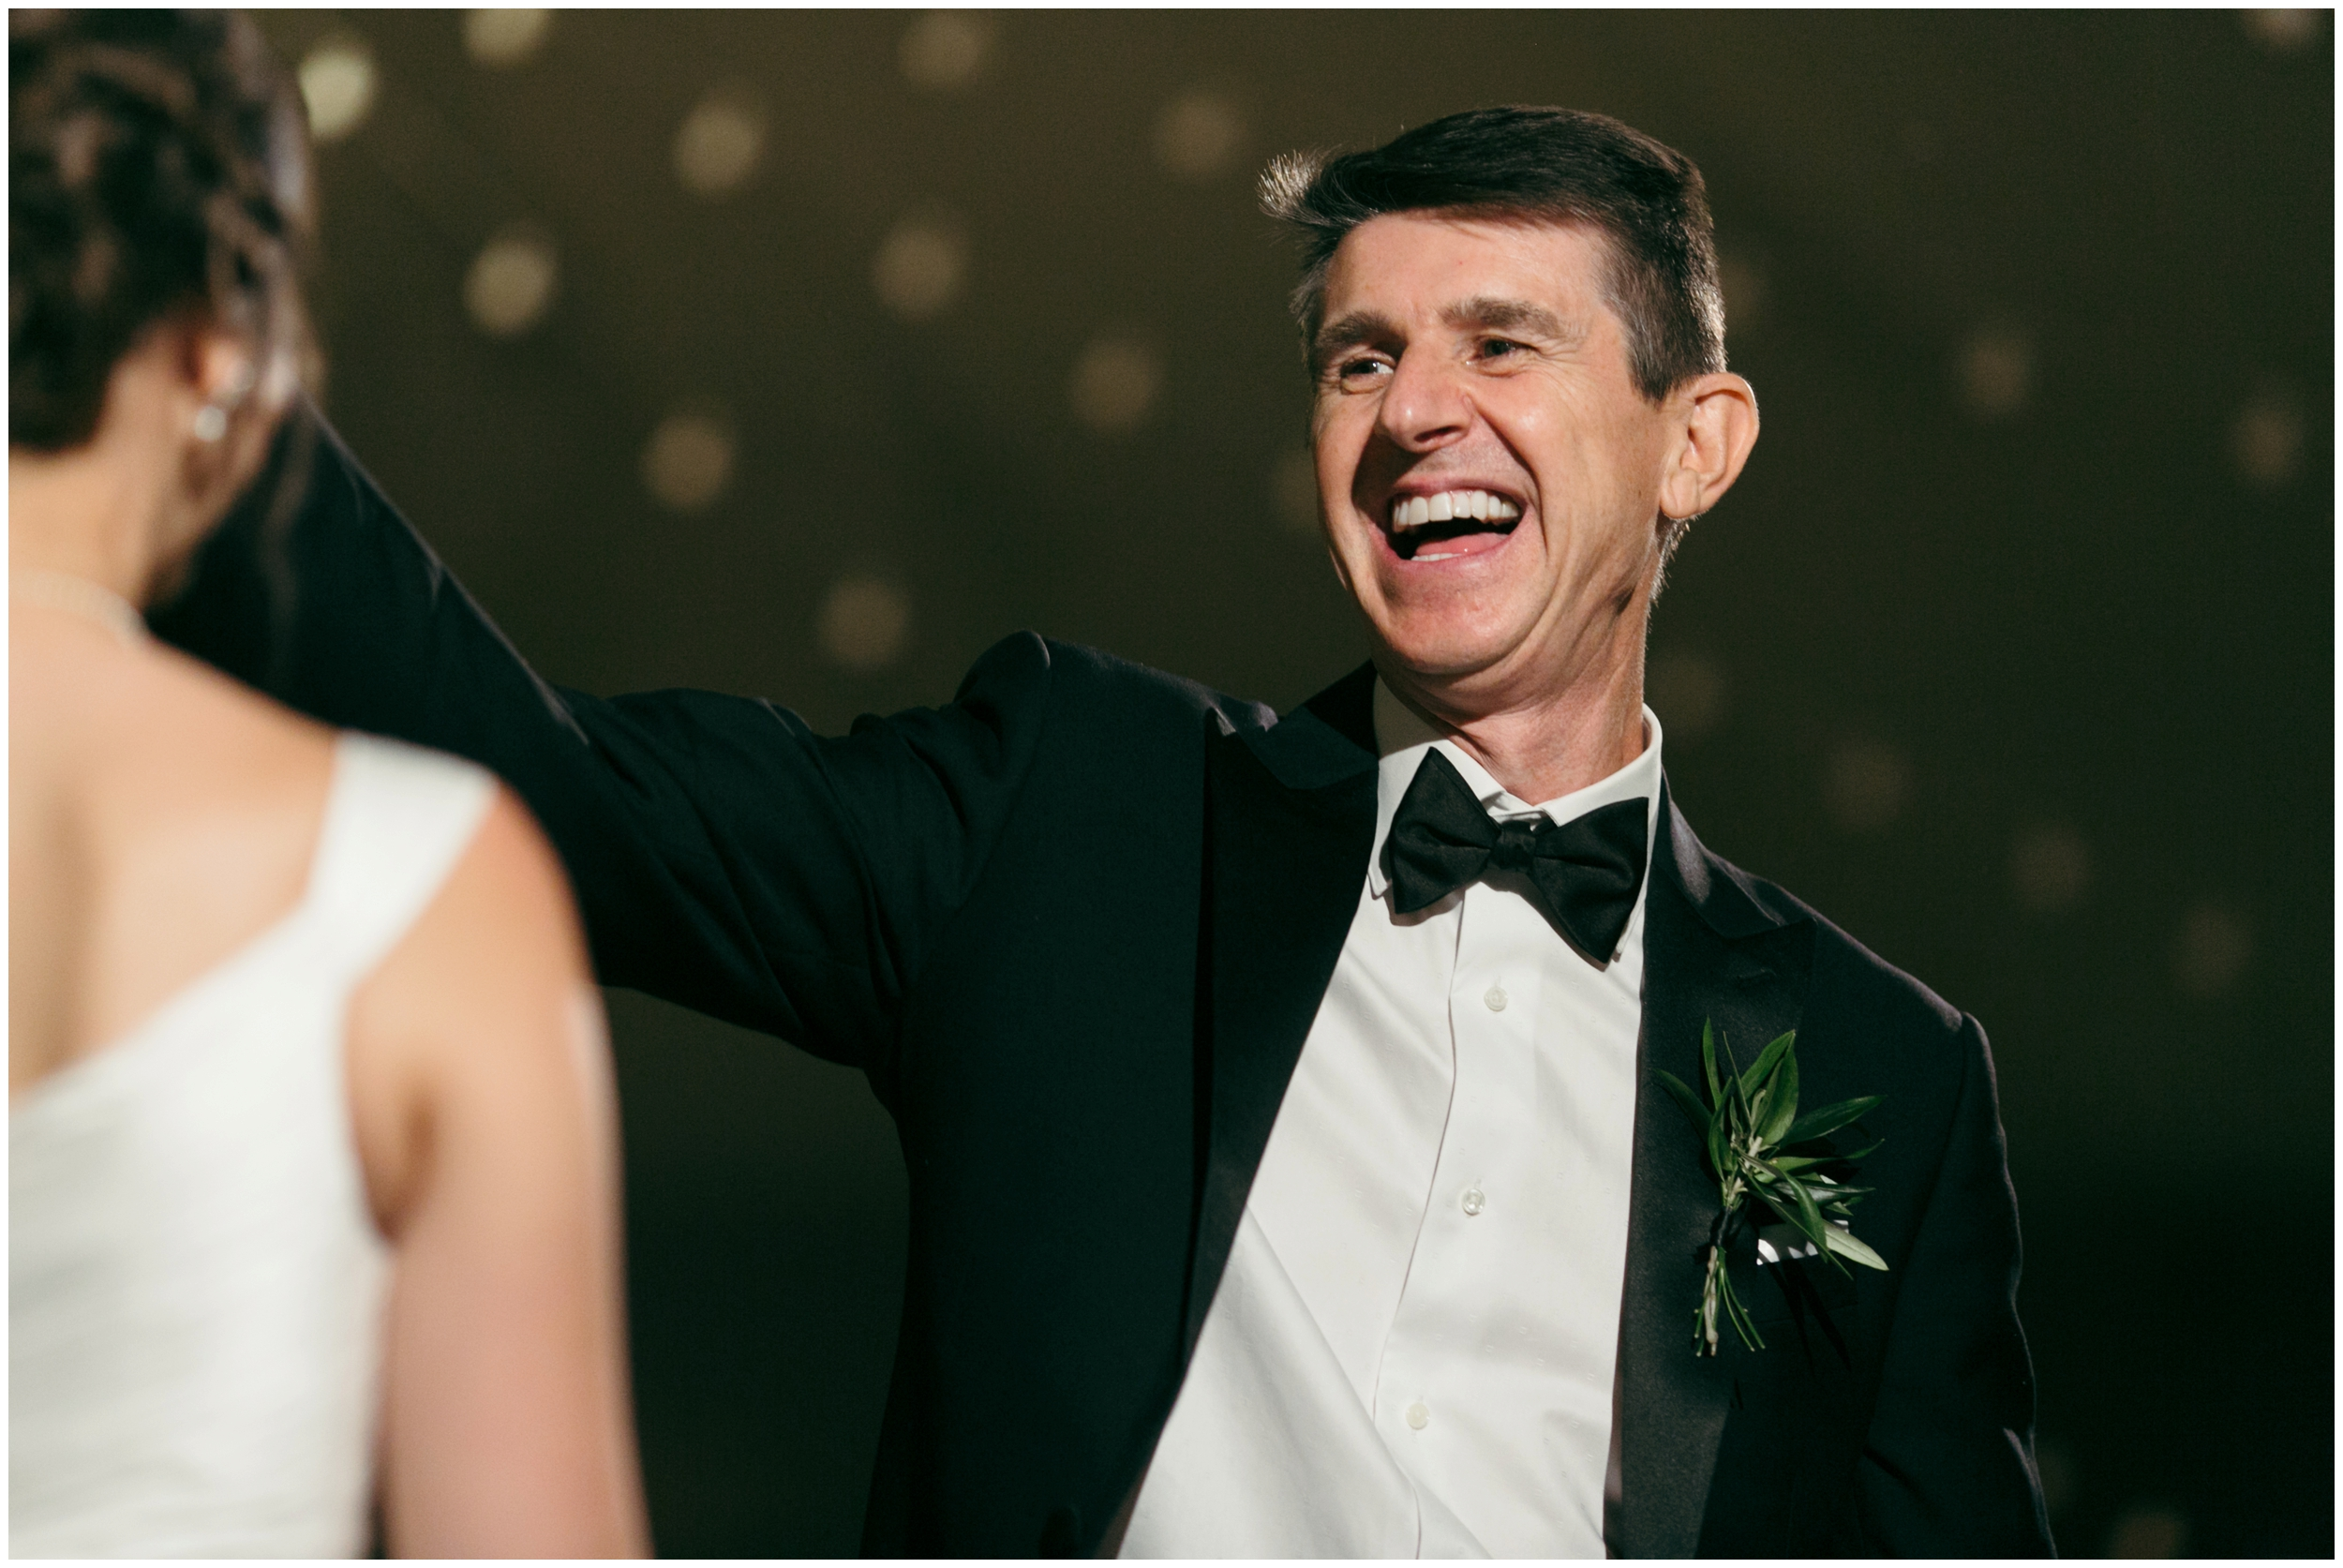 Willowdale-Estate-Wedding-Bailey-Q-Photo-Boston-Wedding-Photographer-098.JPG